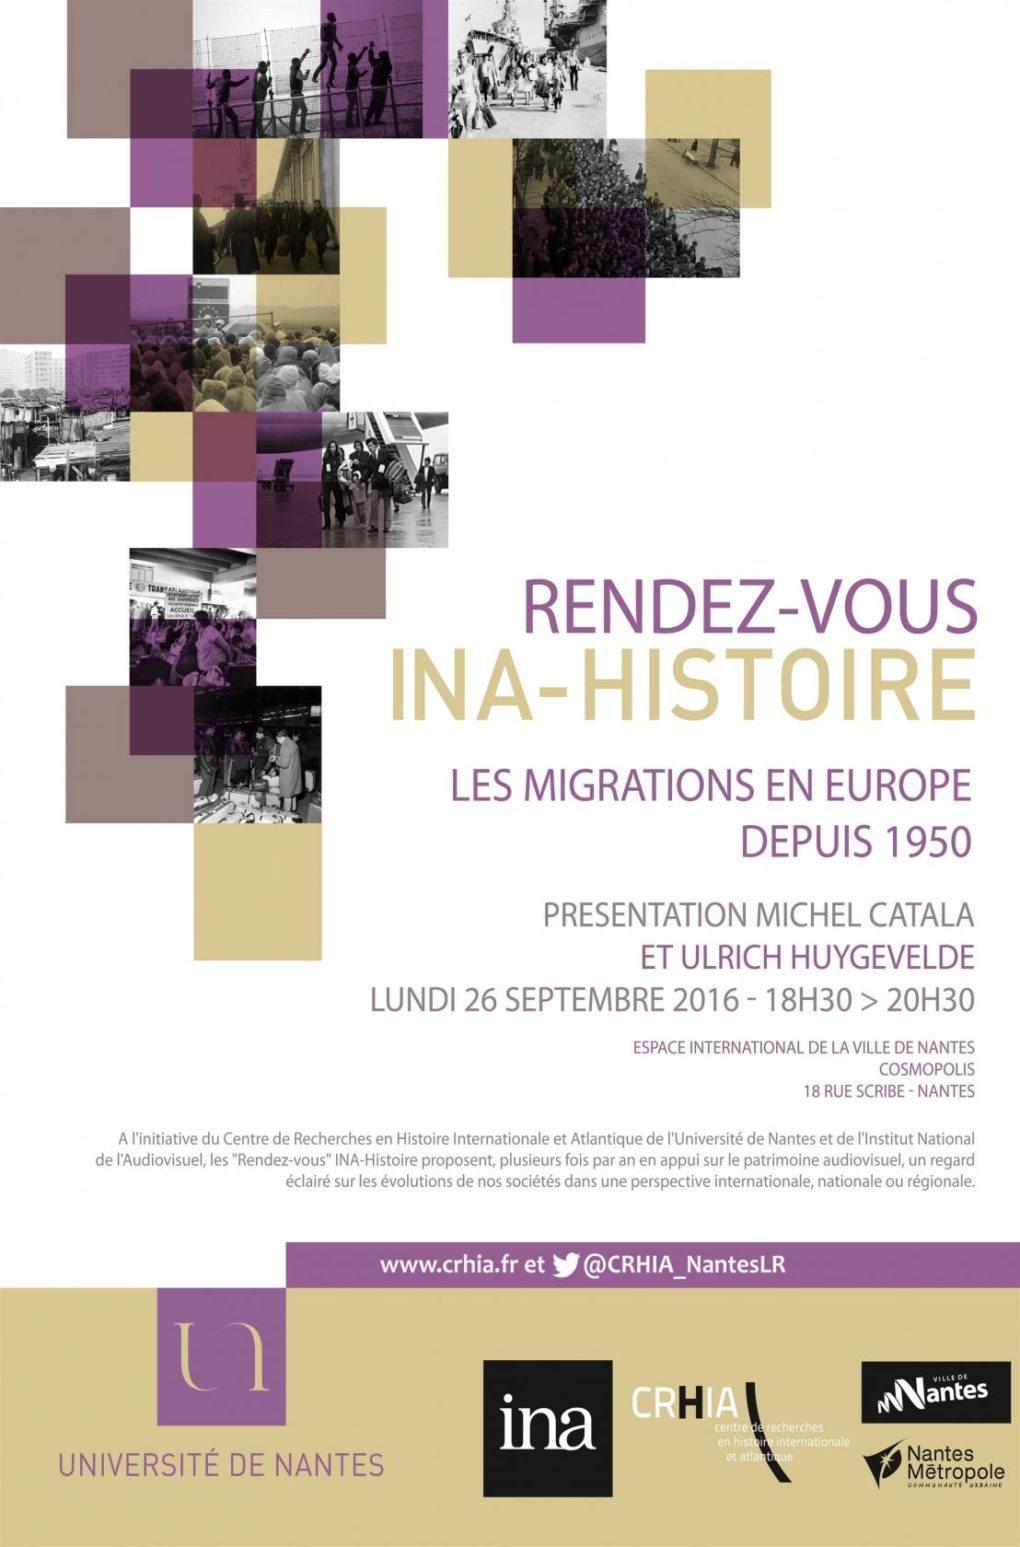 Les migrations en Europe depuis 1950 Nantes